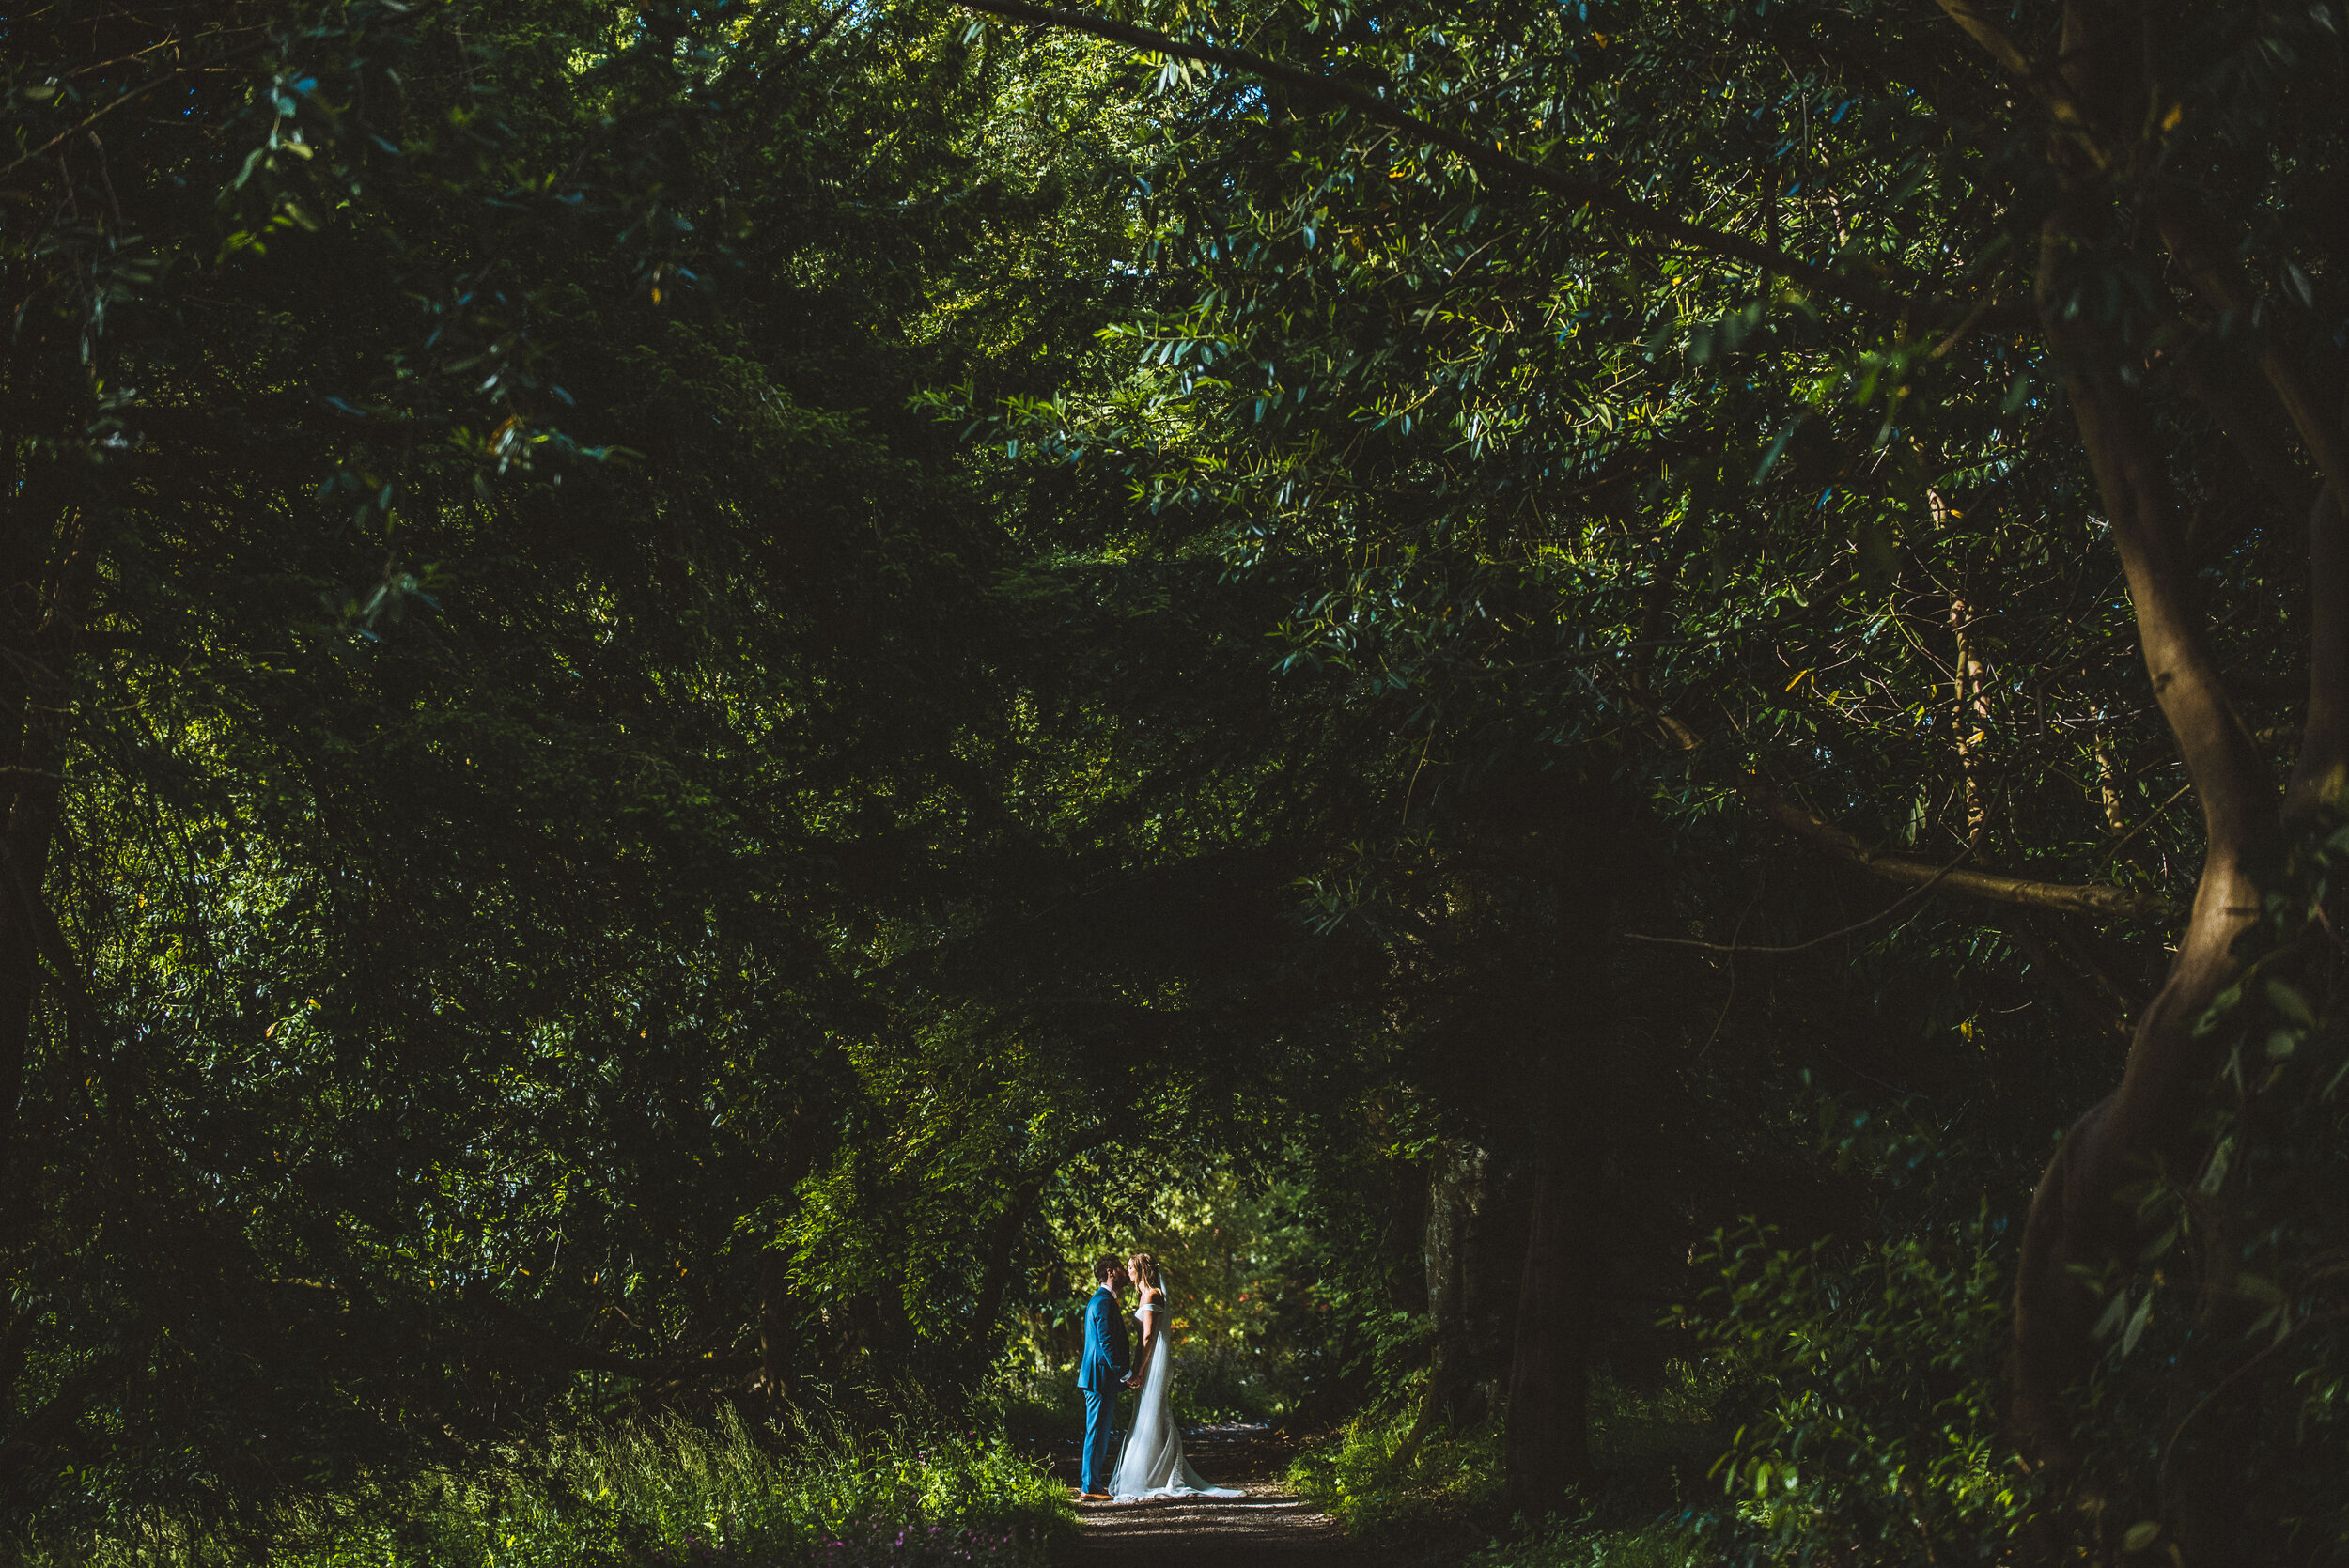 wedding-photographer-cornwall-mark-shaw-19.jpg